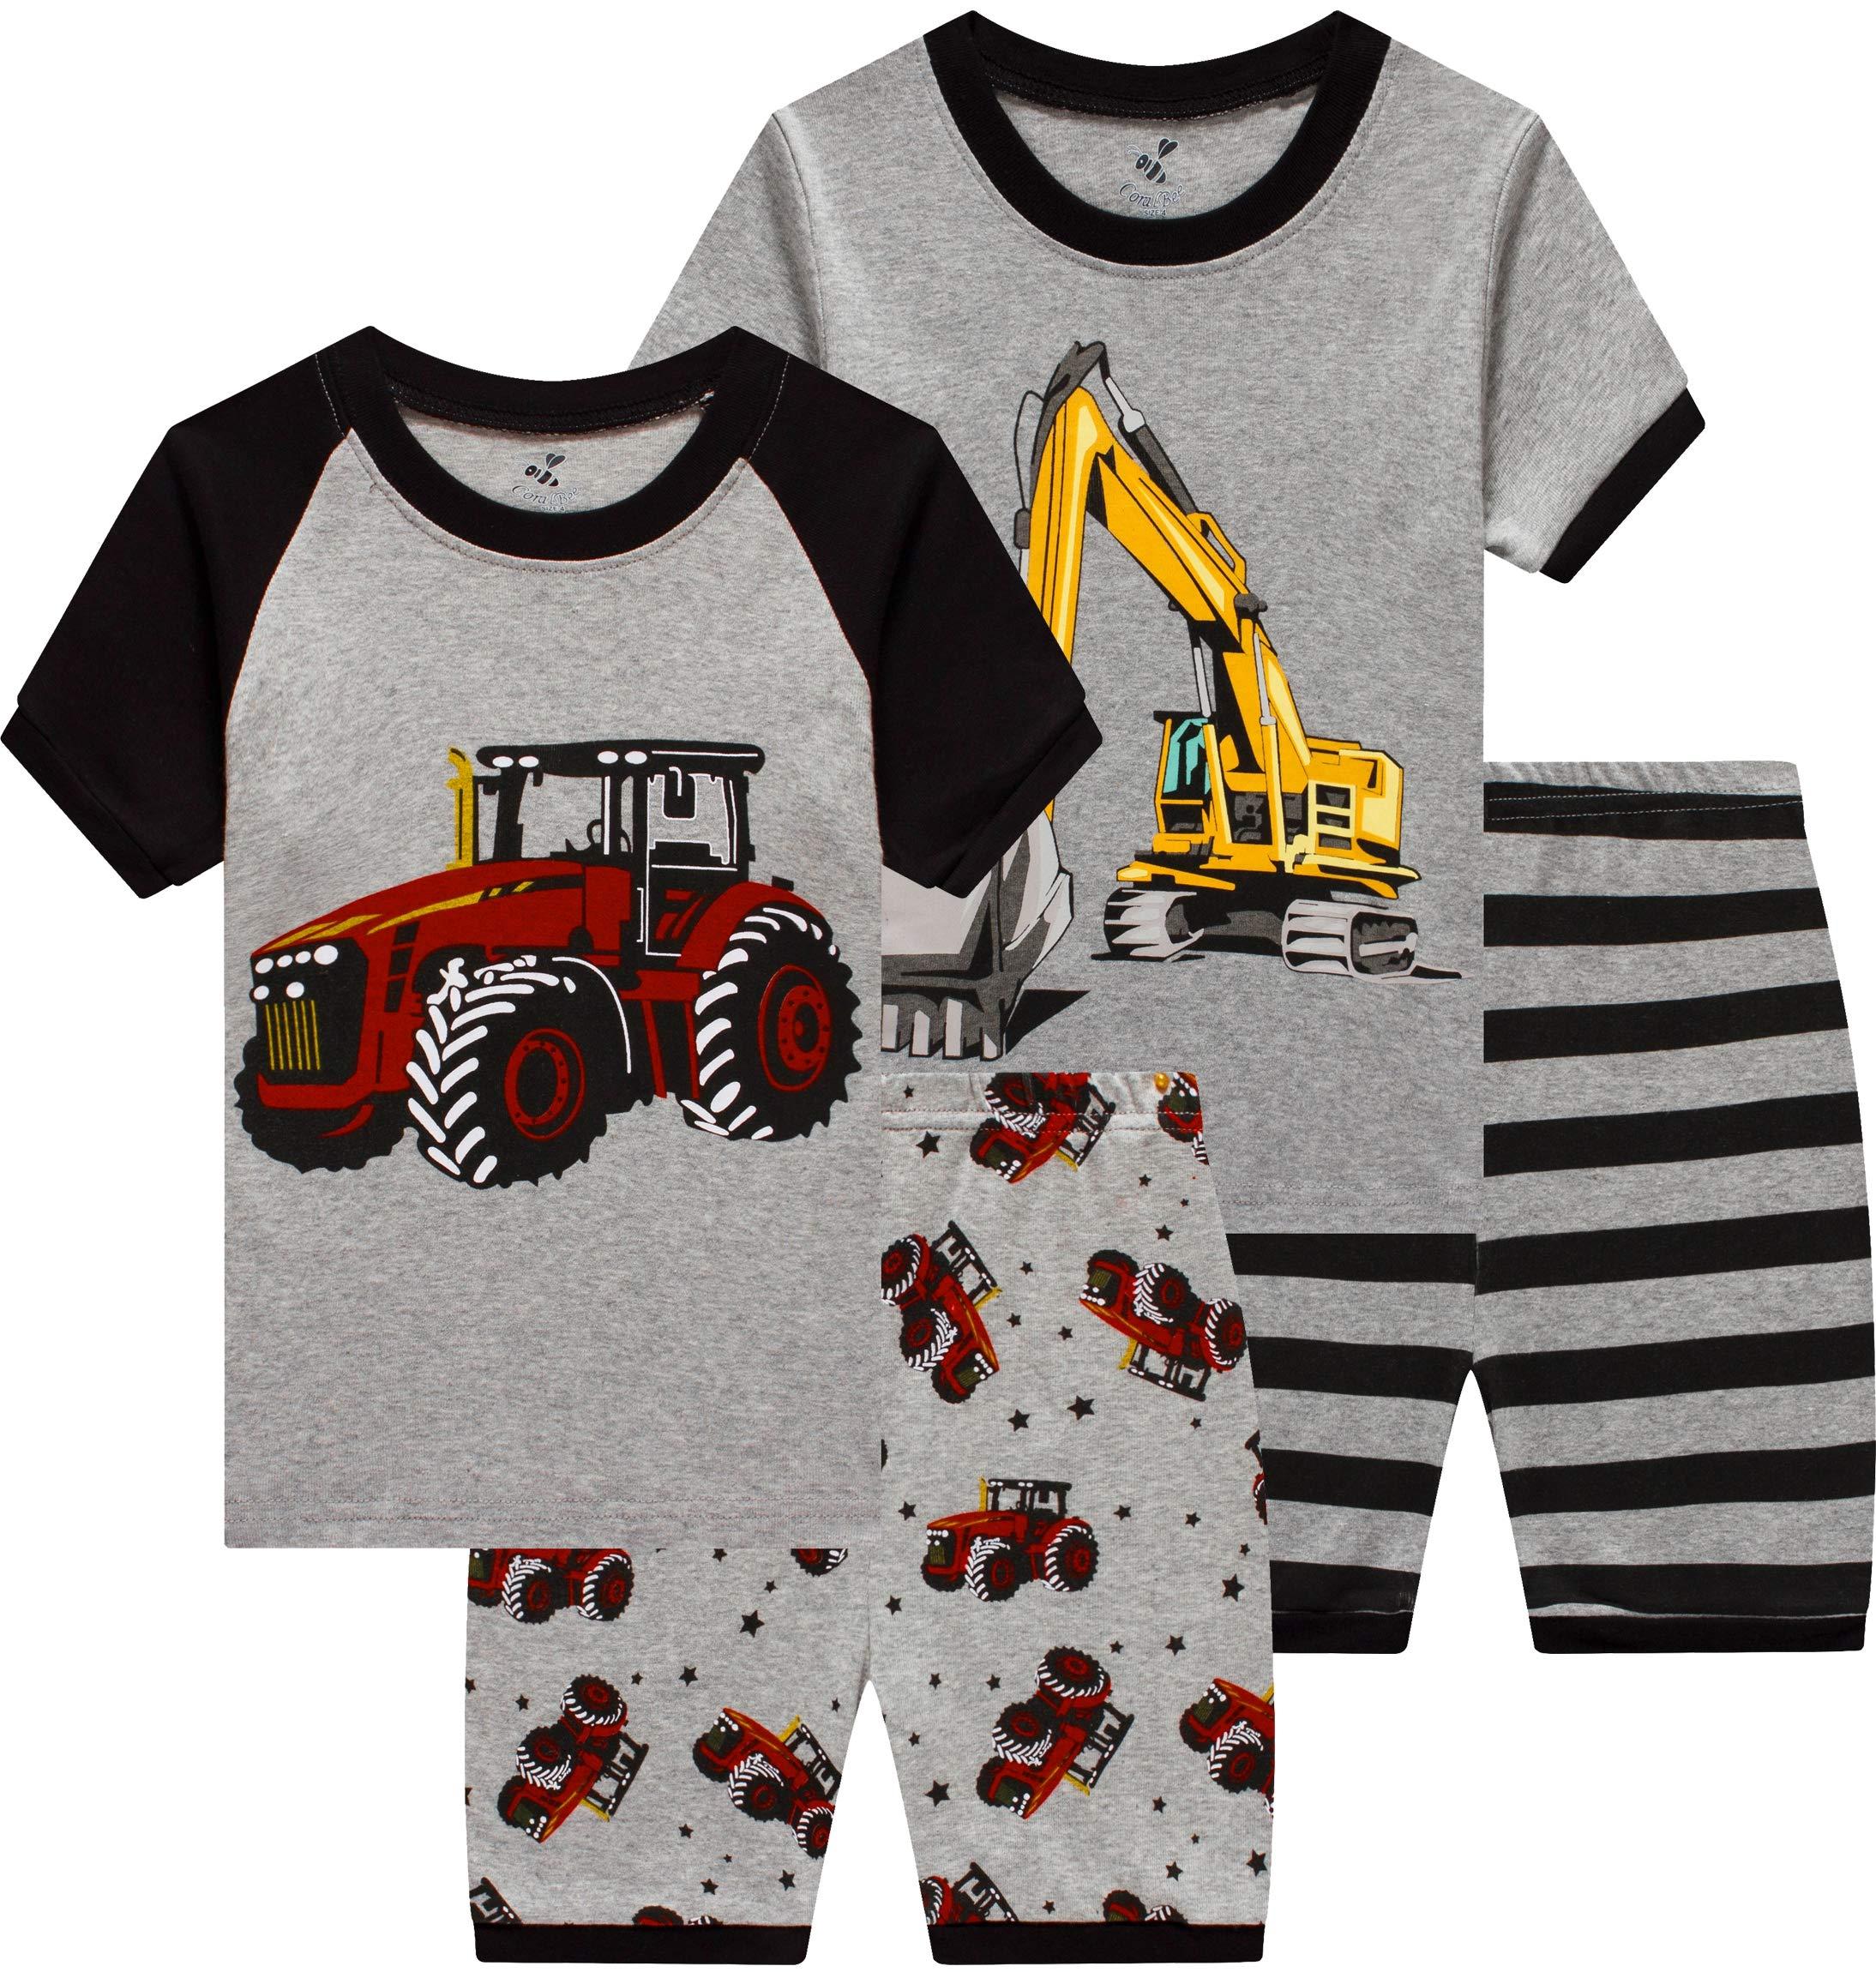 Boys Monster Truck Pajamas 4 Pieces Baby Clothes Summer Kids Bigfoot Car Short PJs Set 7t